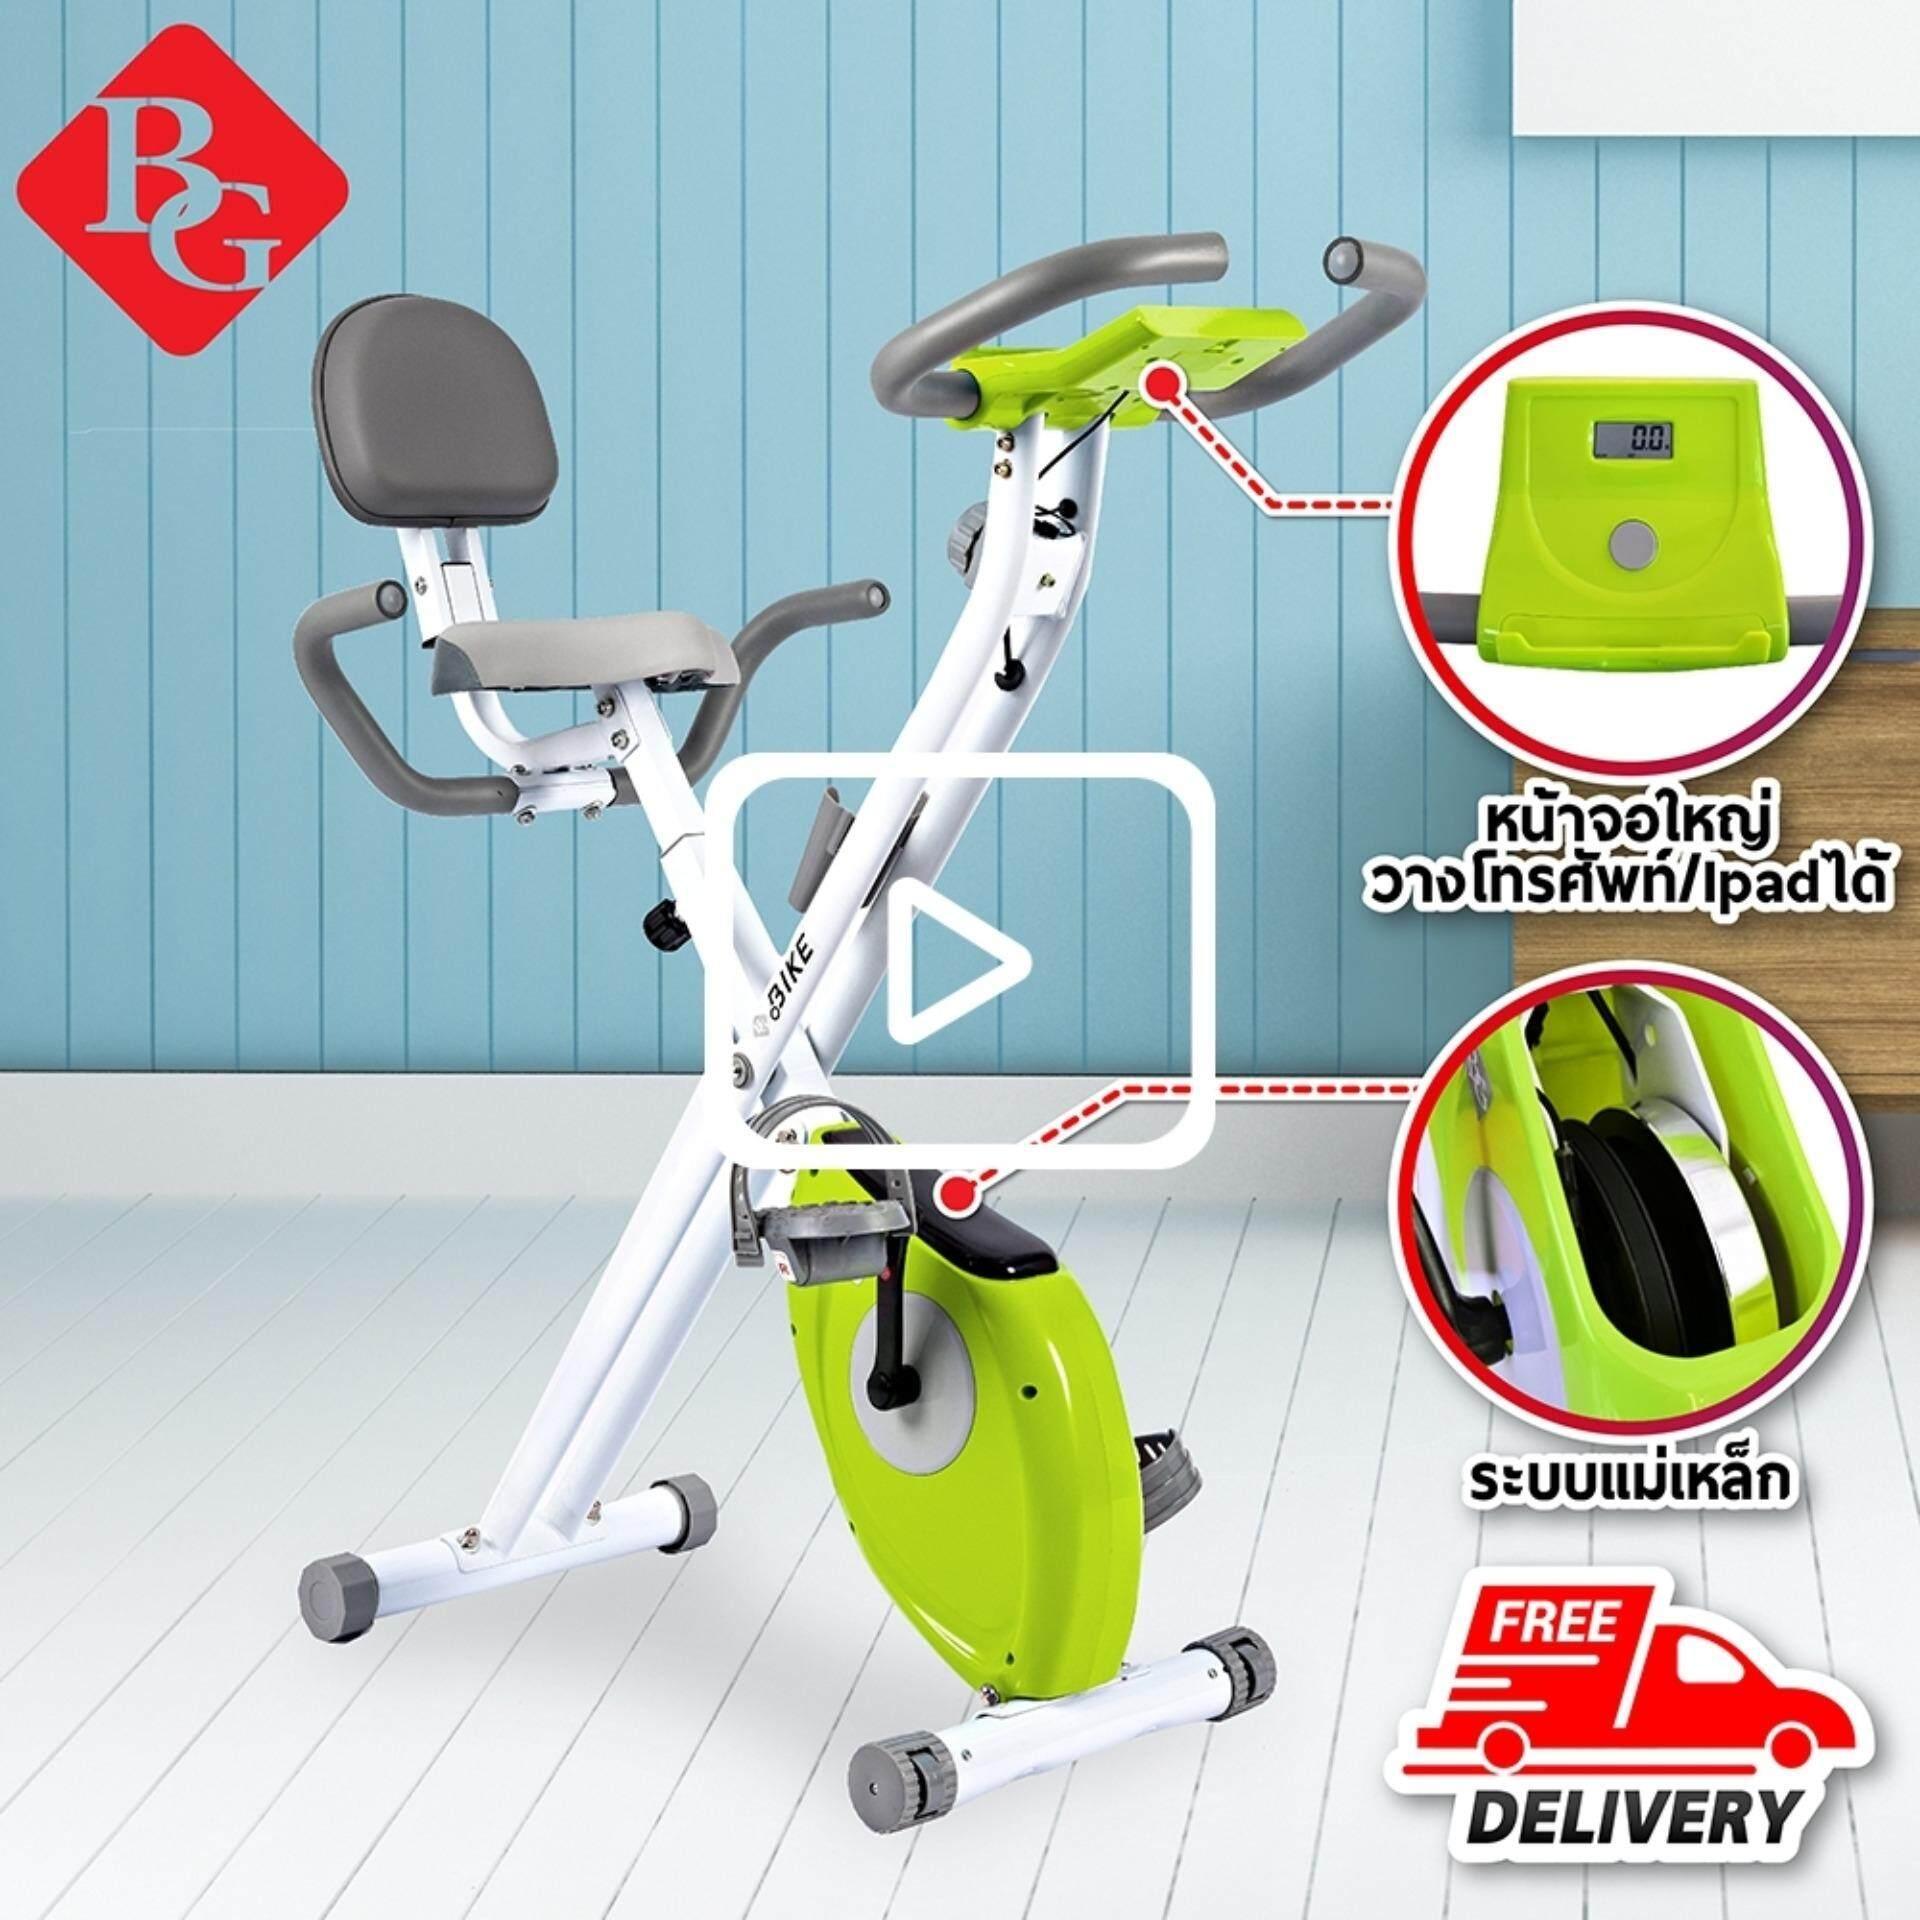 B&G Exercise Bike จักรยานออกกำลังกาย X - Bike (Green) - รุ่น YS04